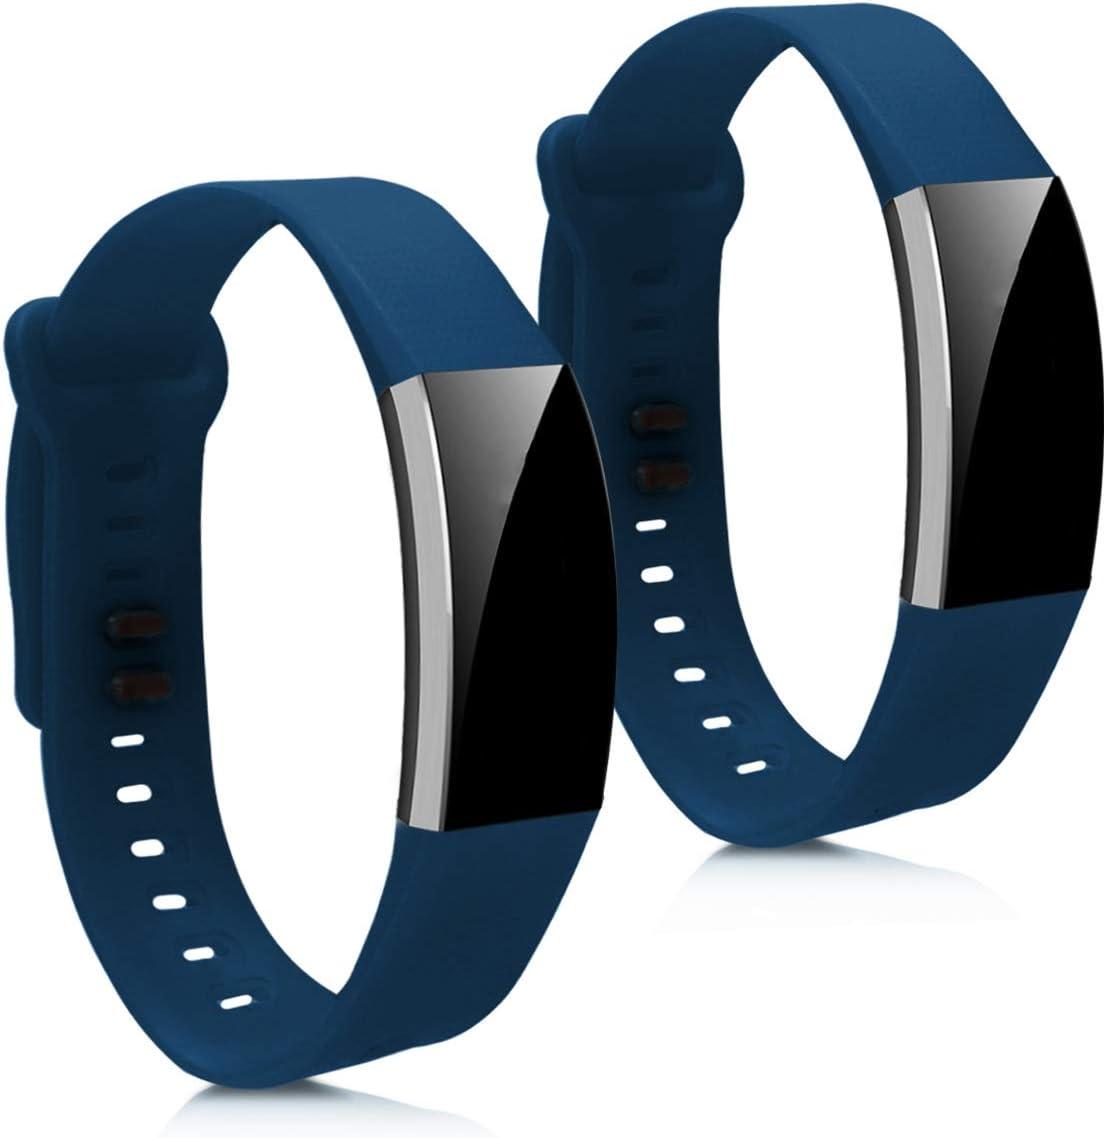 kwmobile 2X Pulsera Compatible con Huawei Band 2 / Band 2 Pro - Brazalete de Silicona Azul Oscuro sin Fitness Tracker